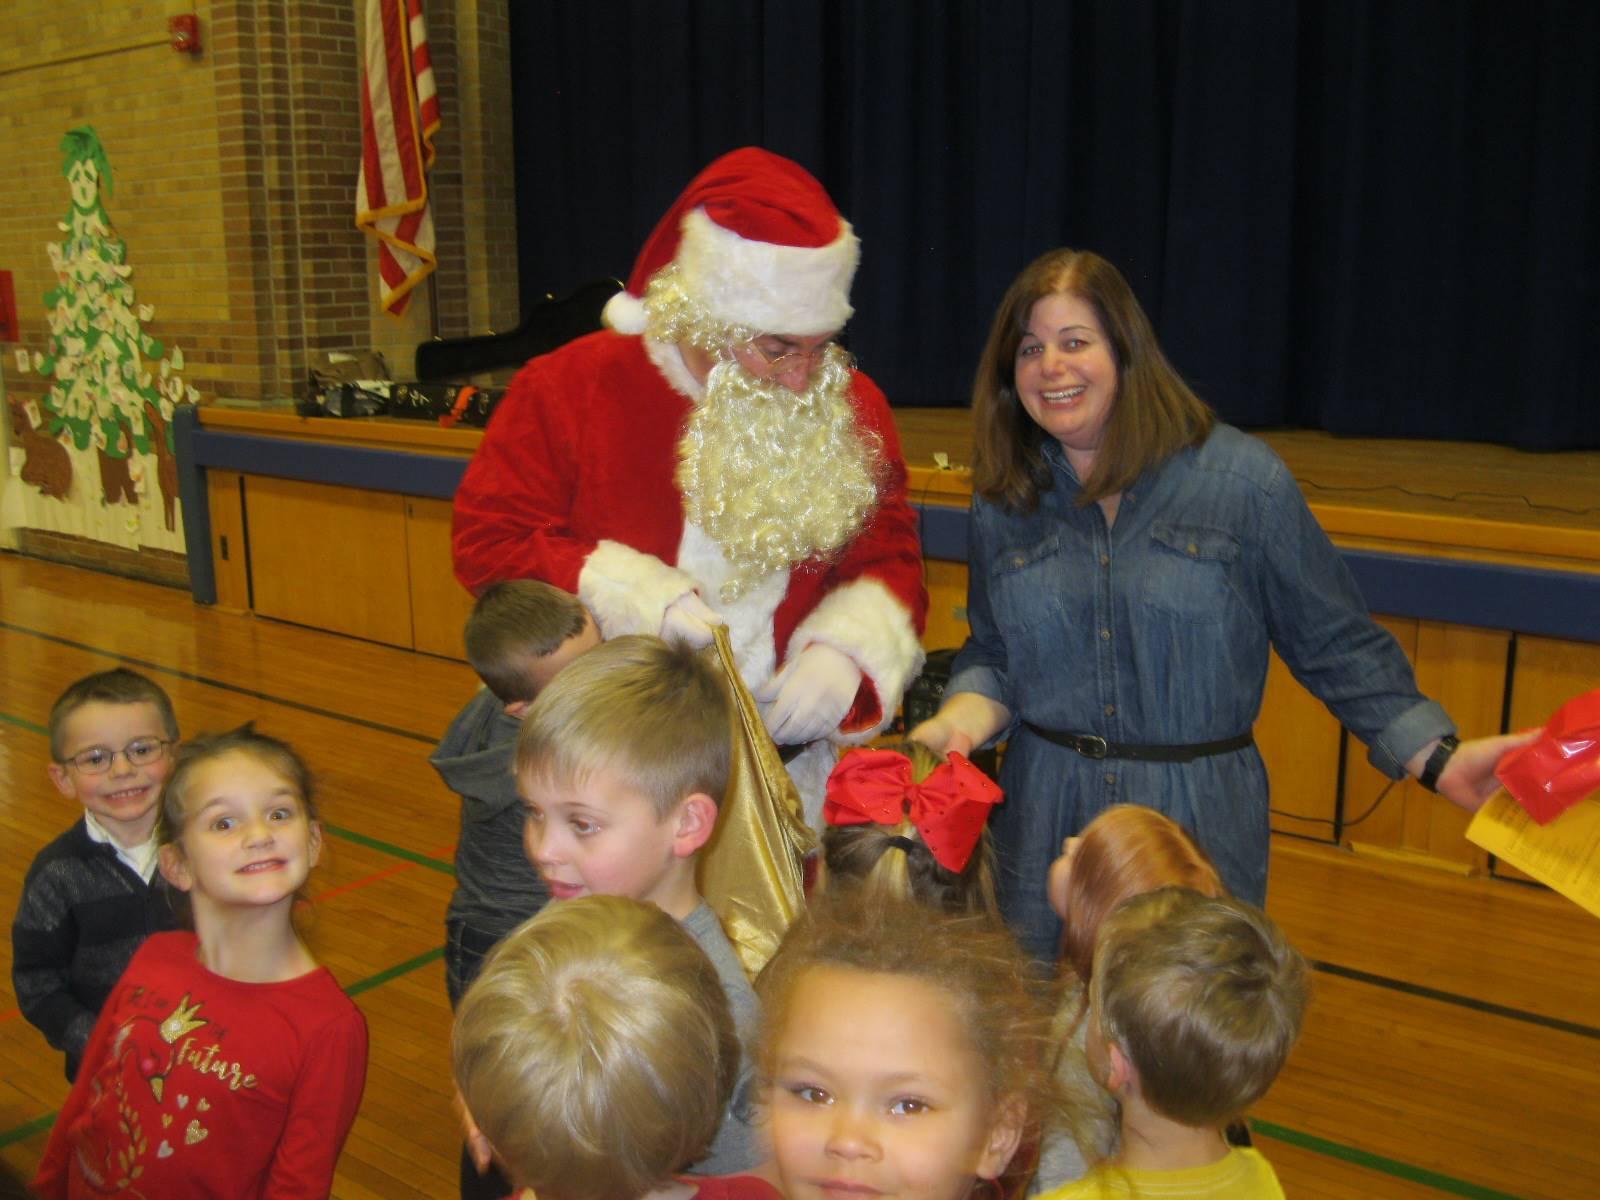 Santa and a teacher smile together.